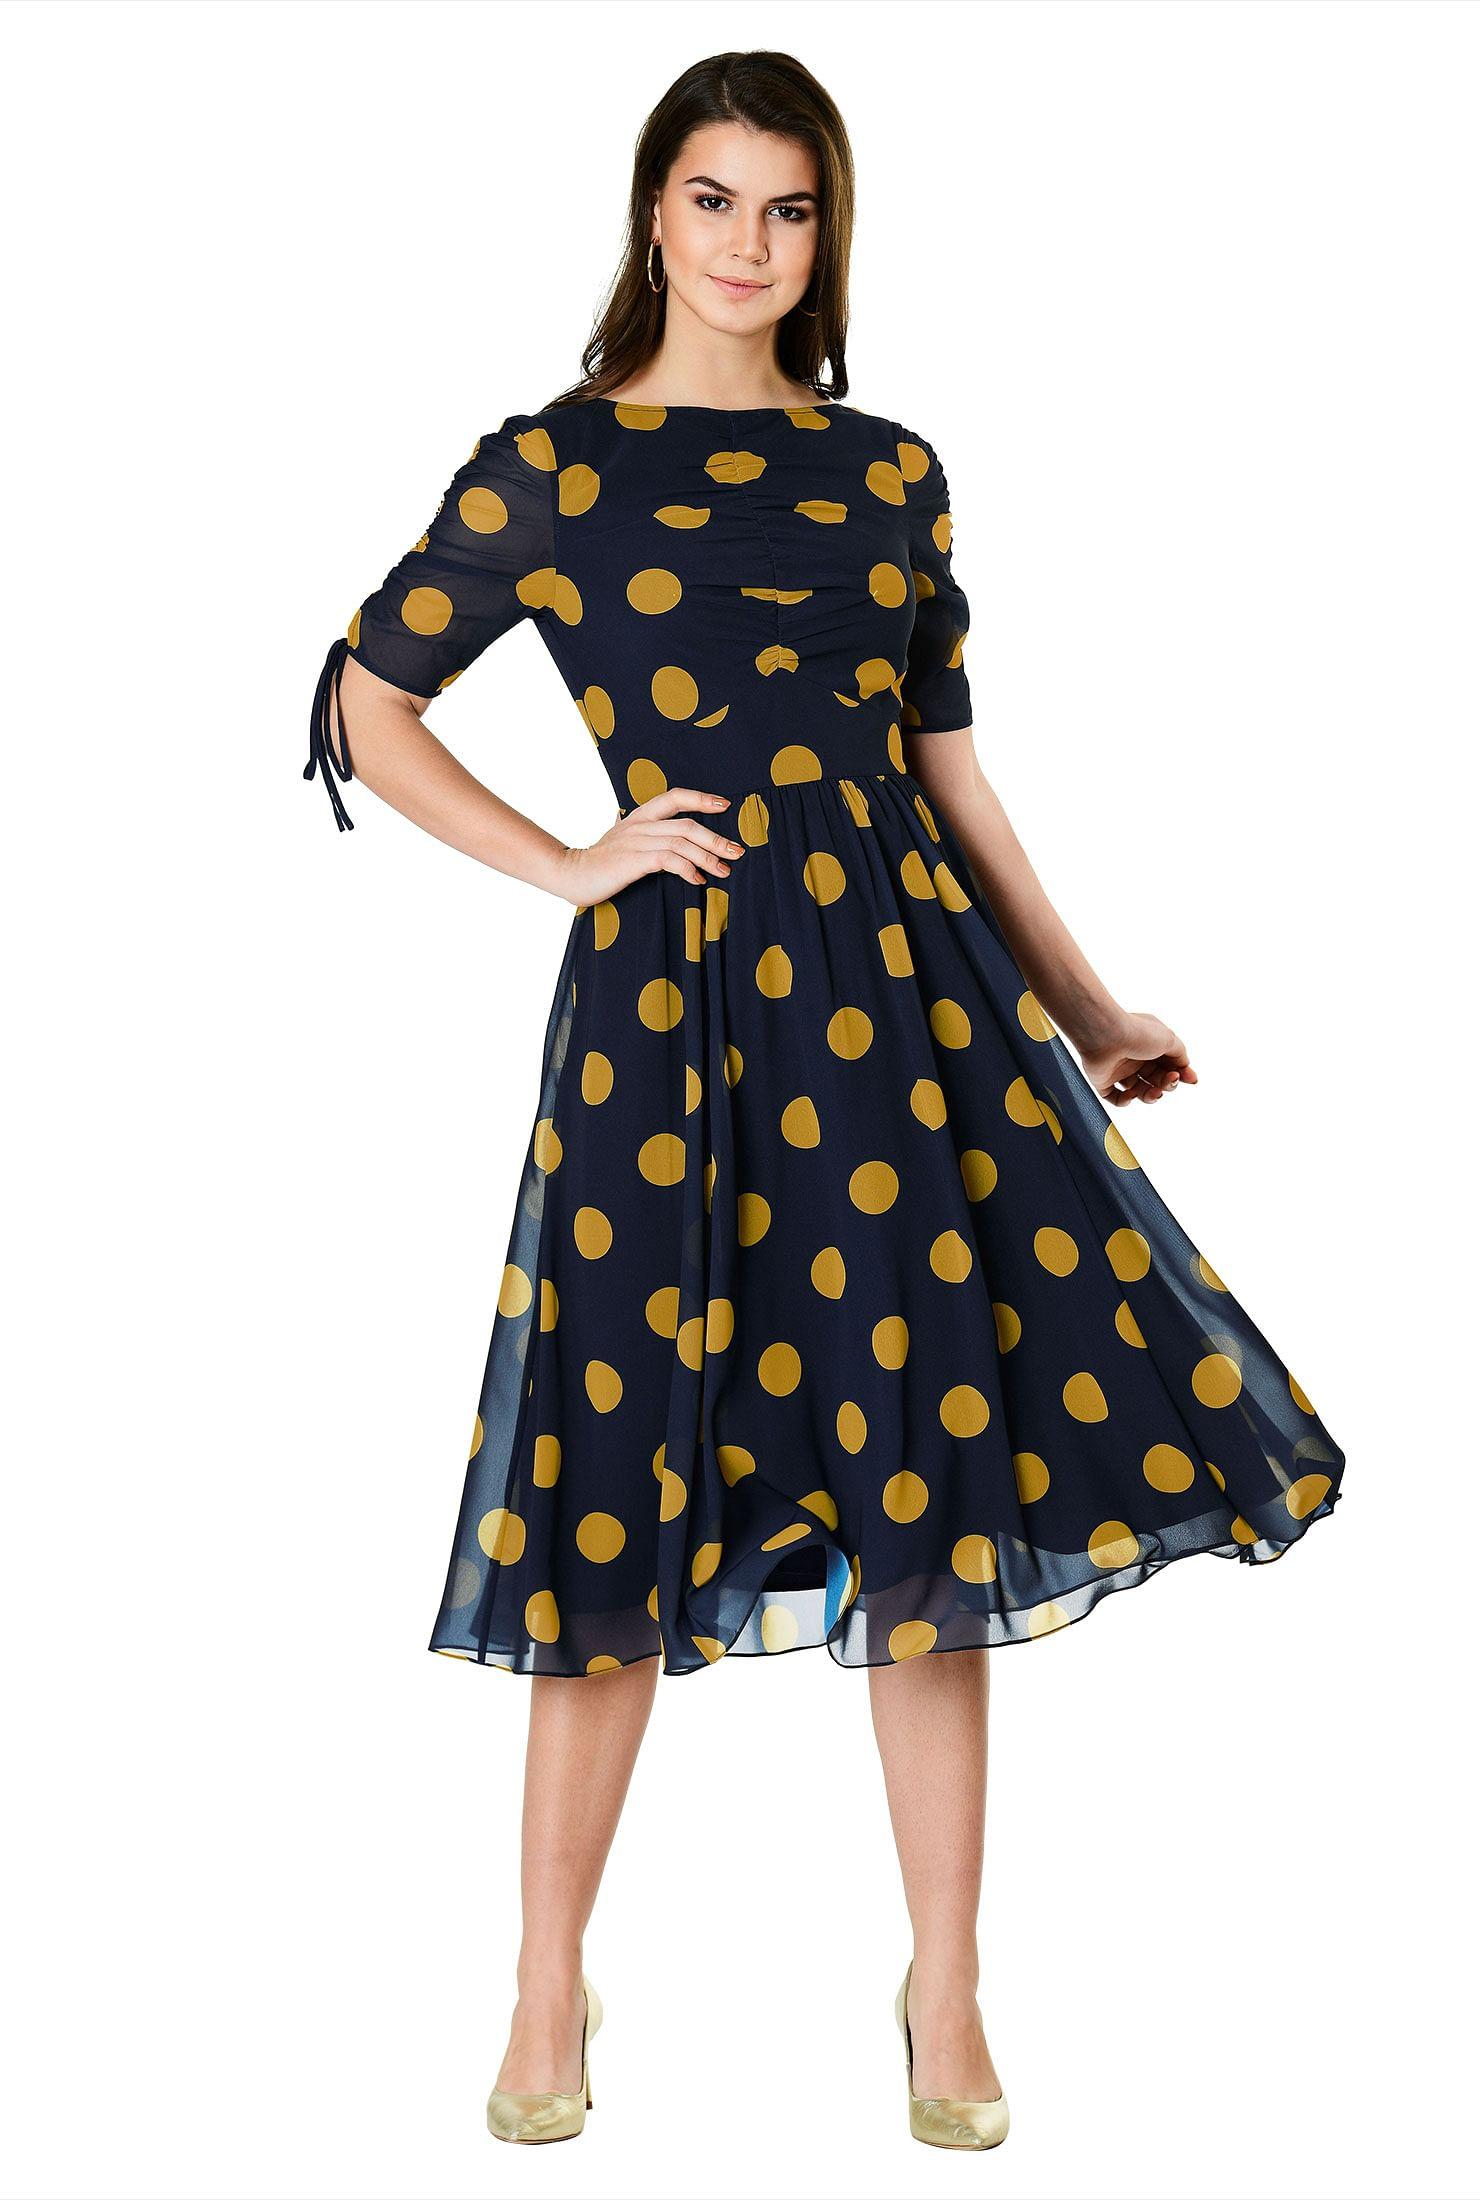 56e026f6c56 Women s Fashion Clothing 0-36W and Custom